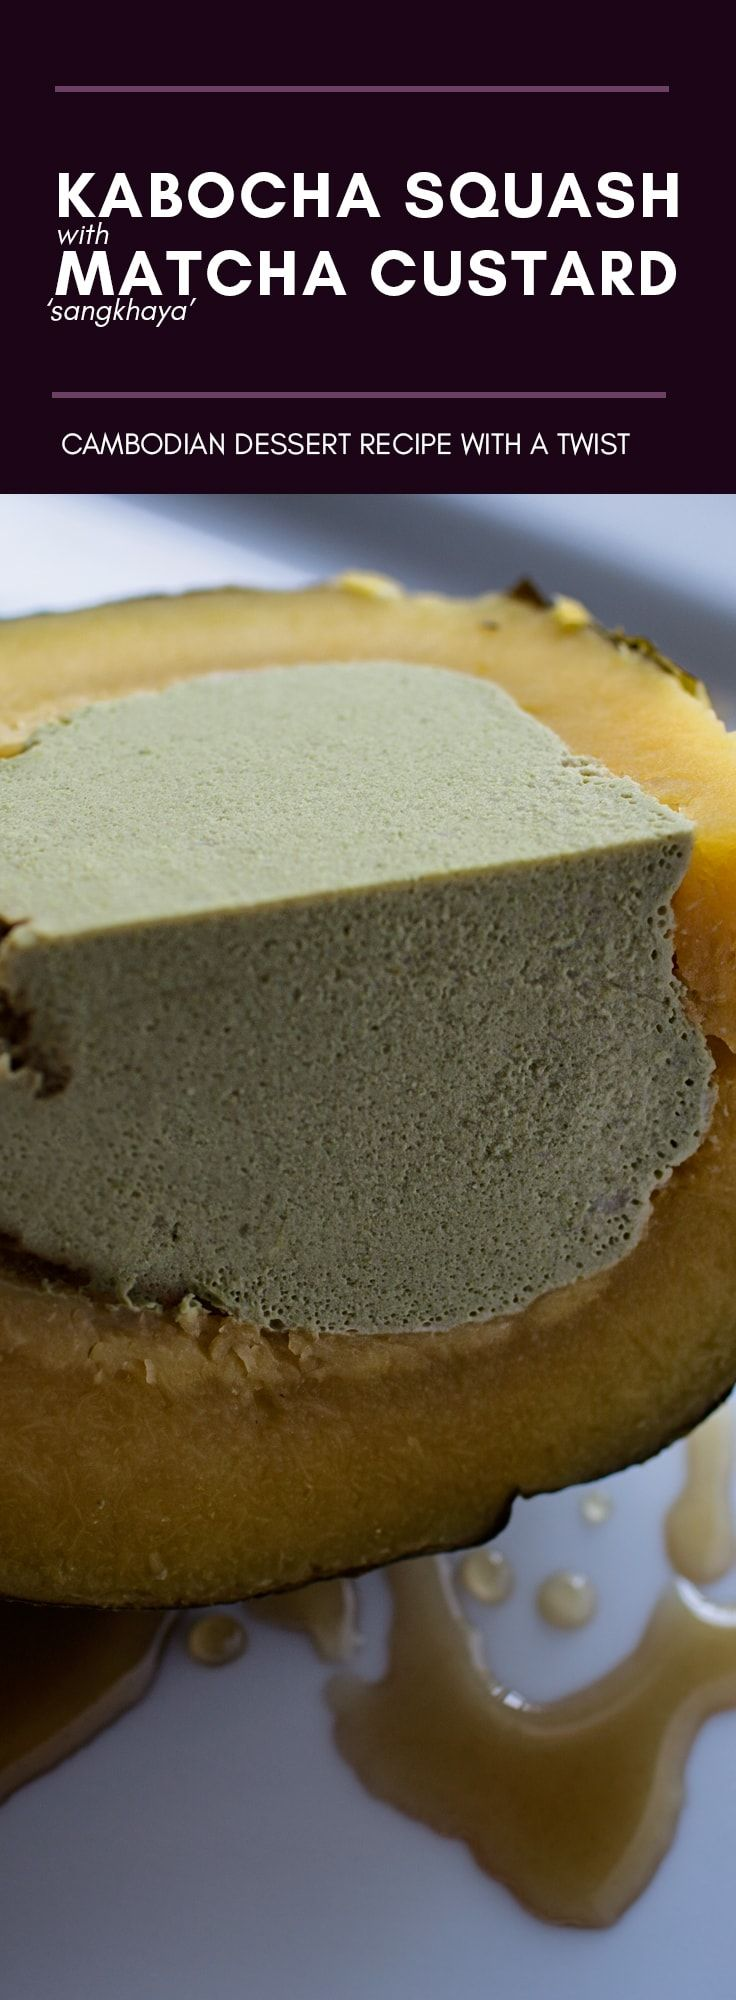 Thai Dessert Recipes - thespruceeats.com